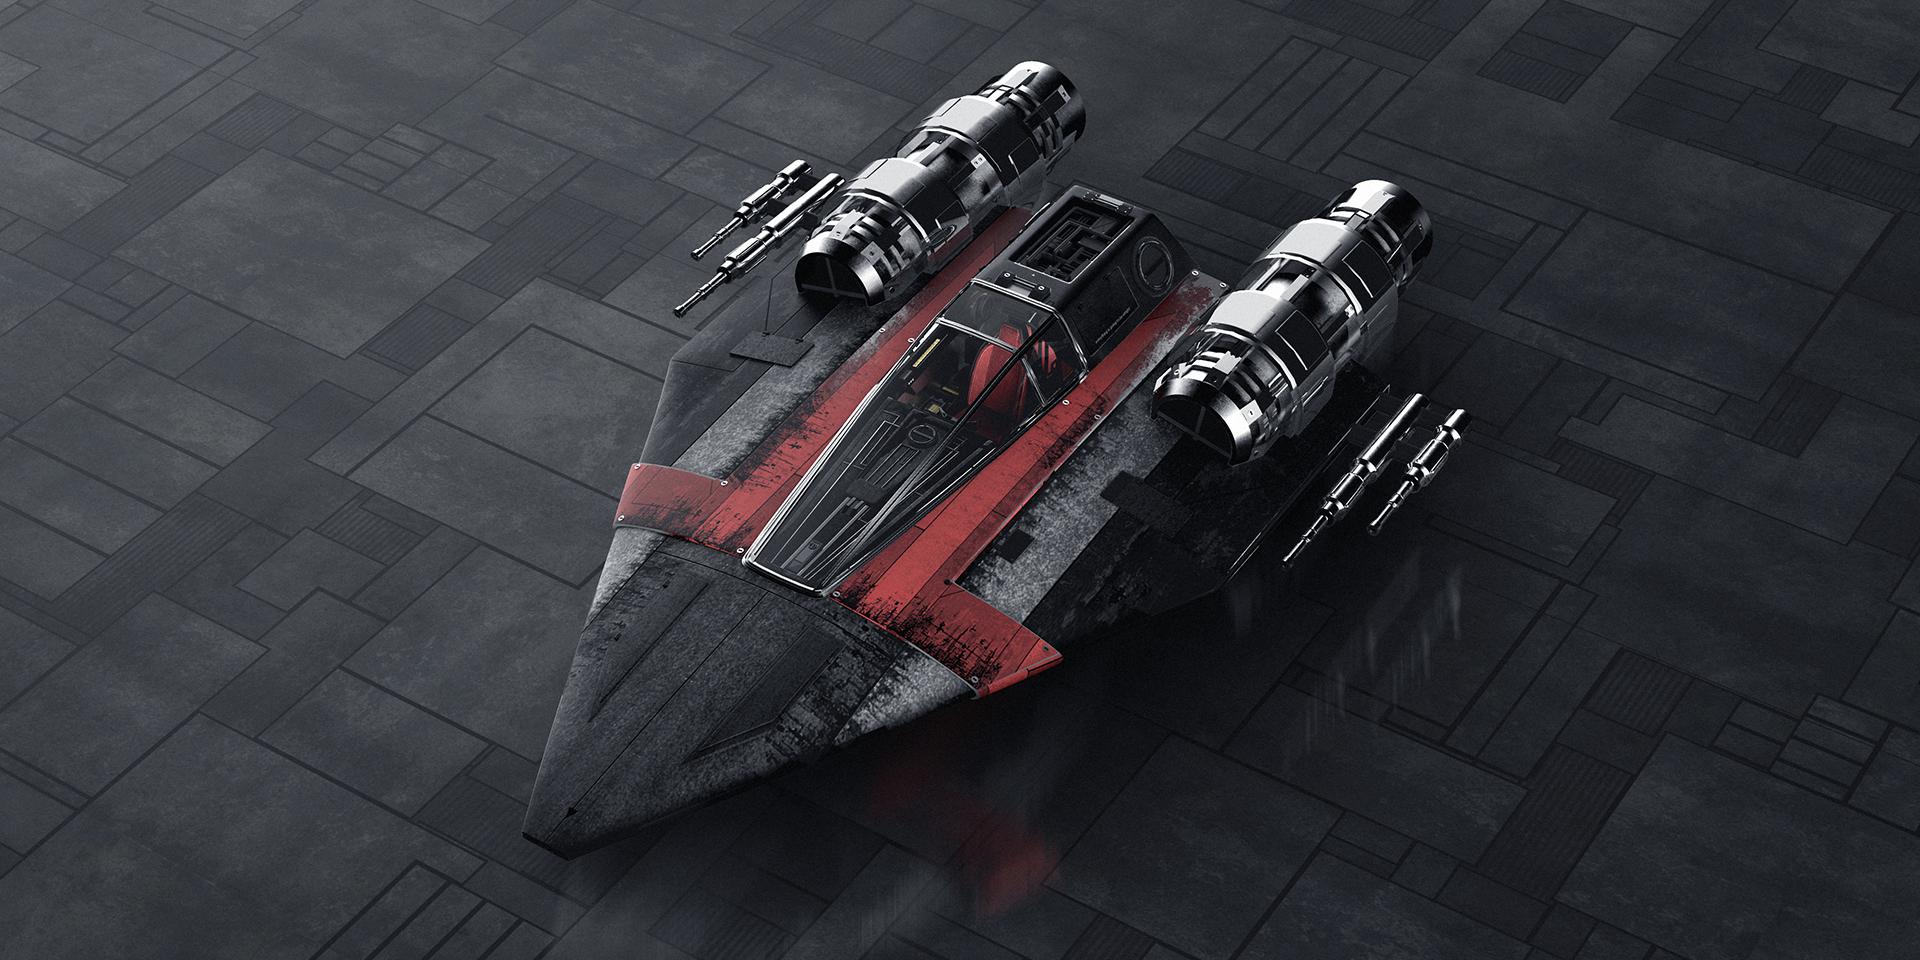 spaceship_008_front_01_web